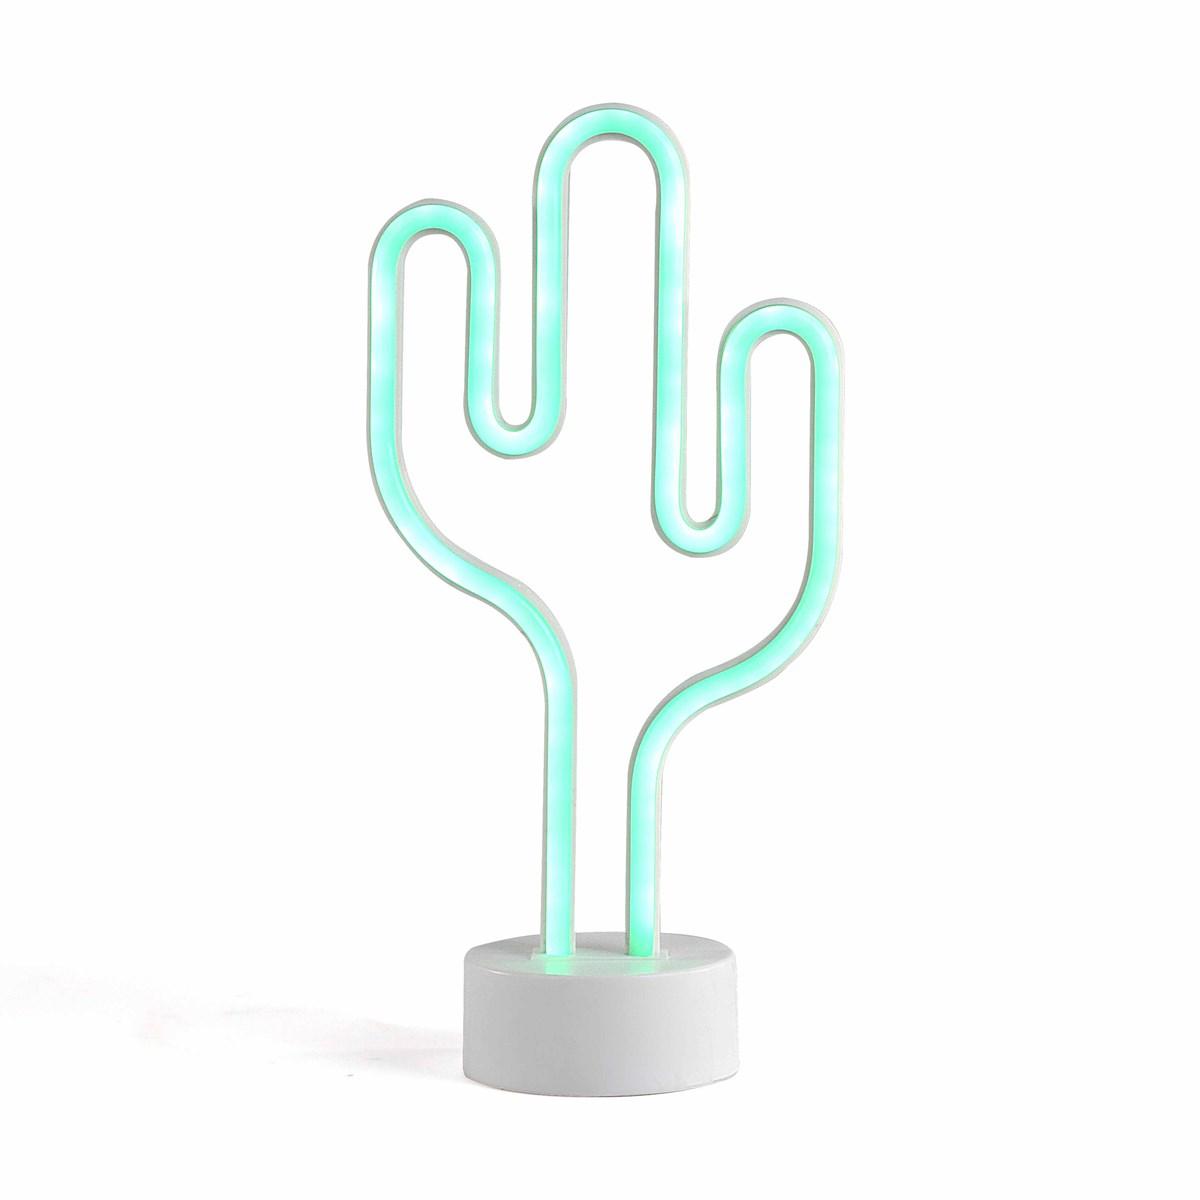 Lampe neon cactus en plastique blanc